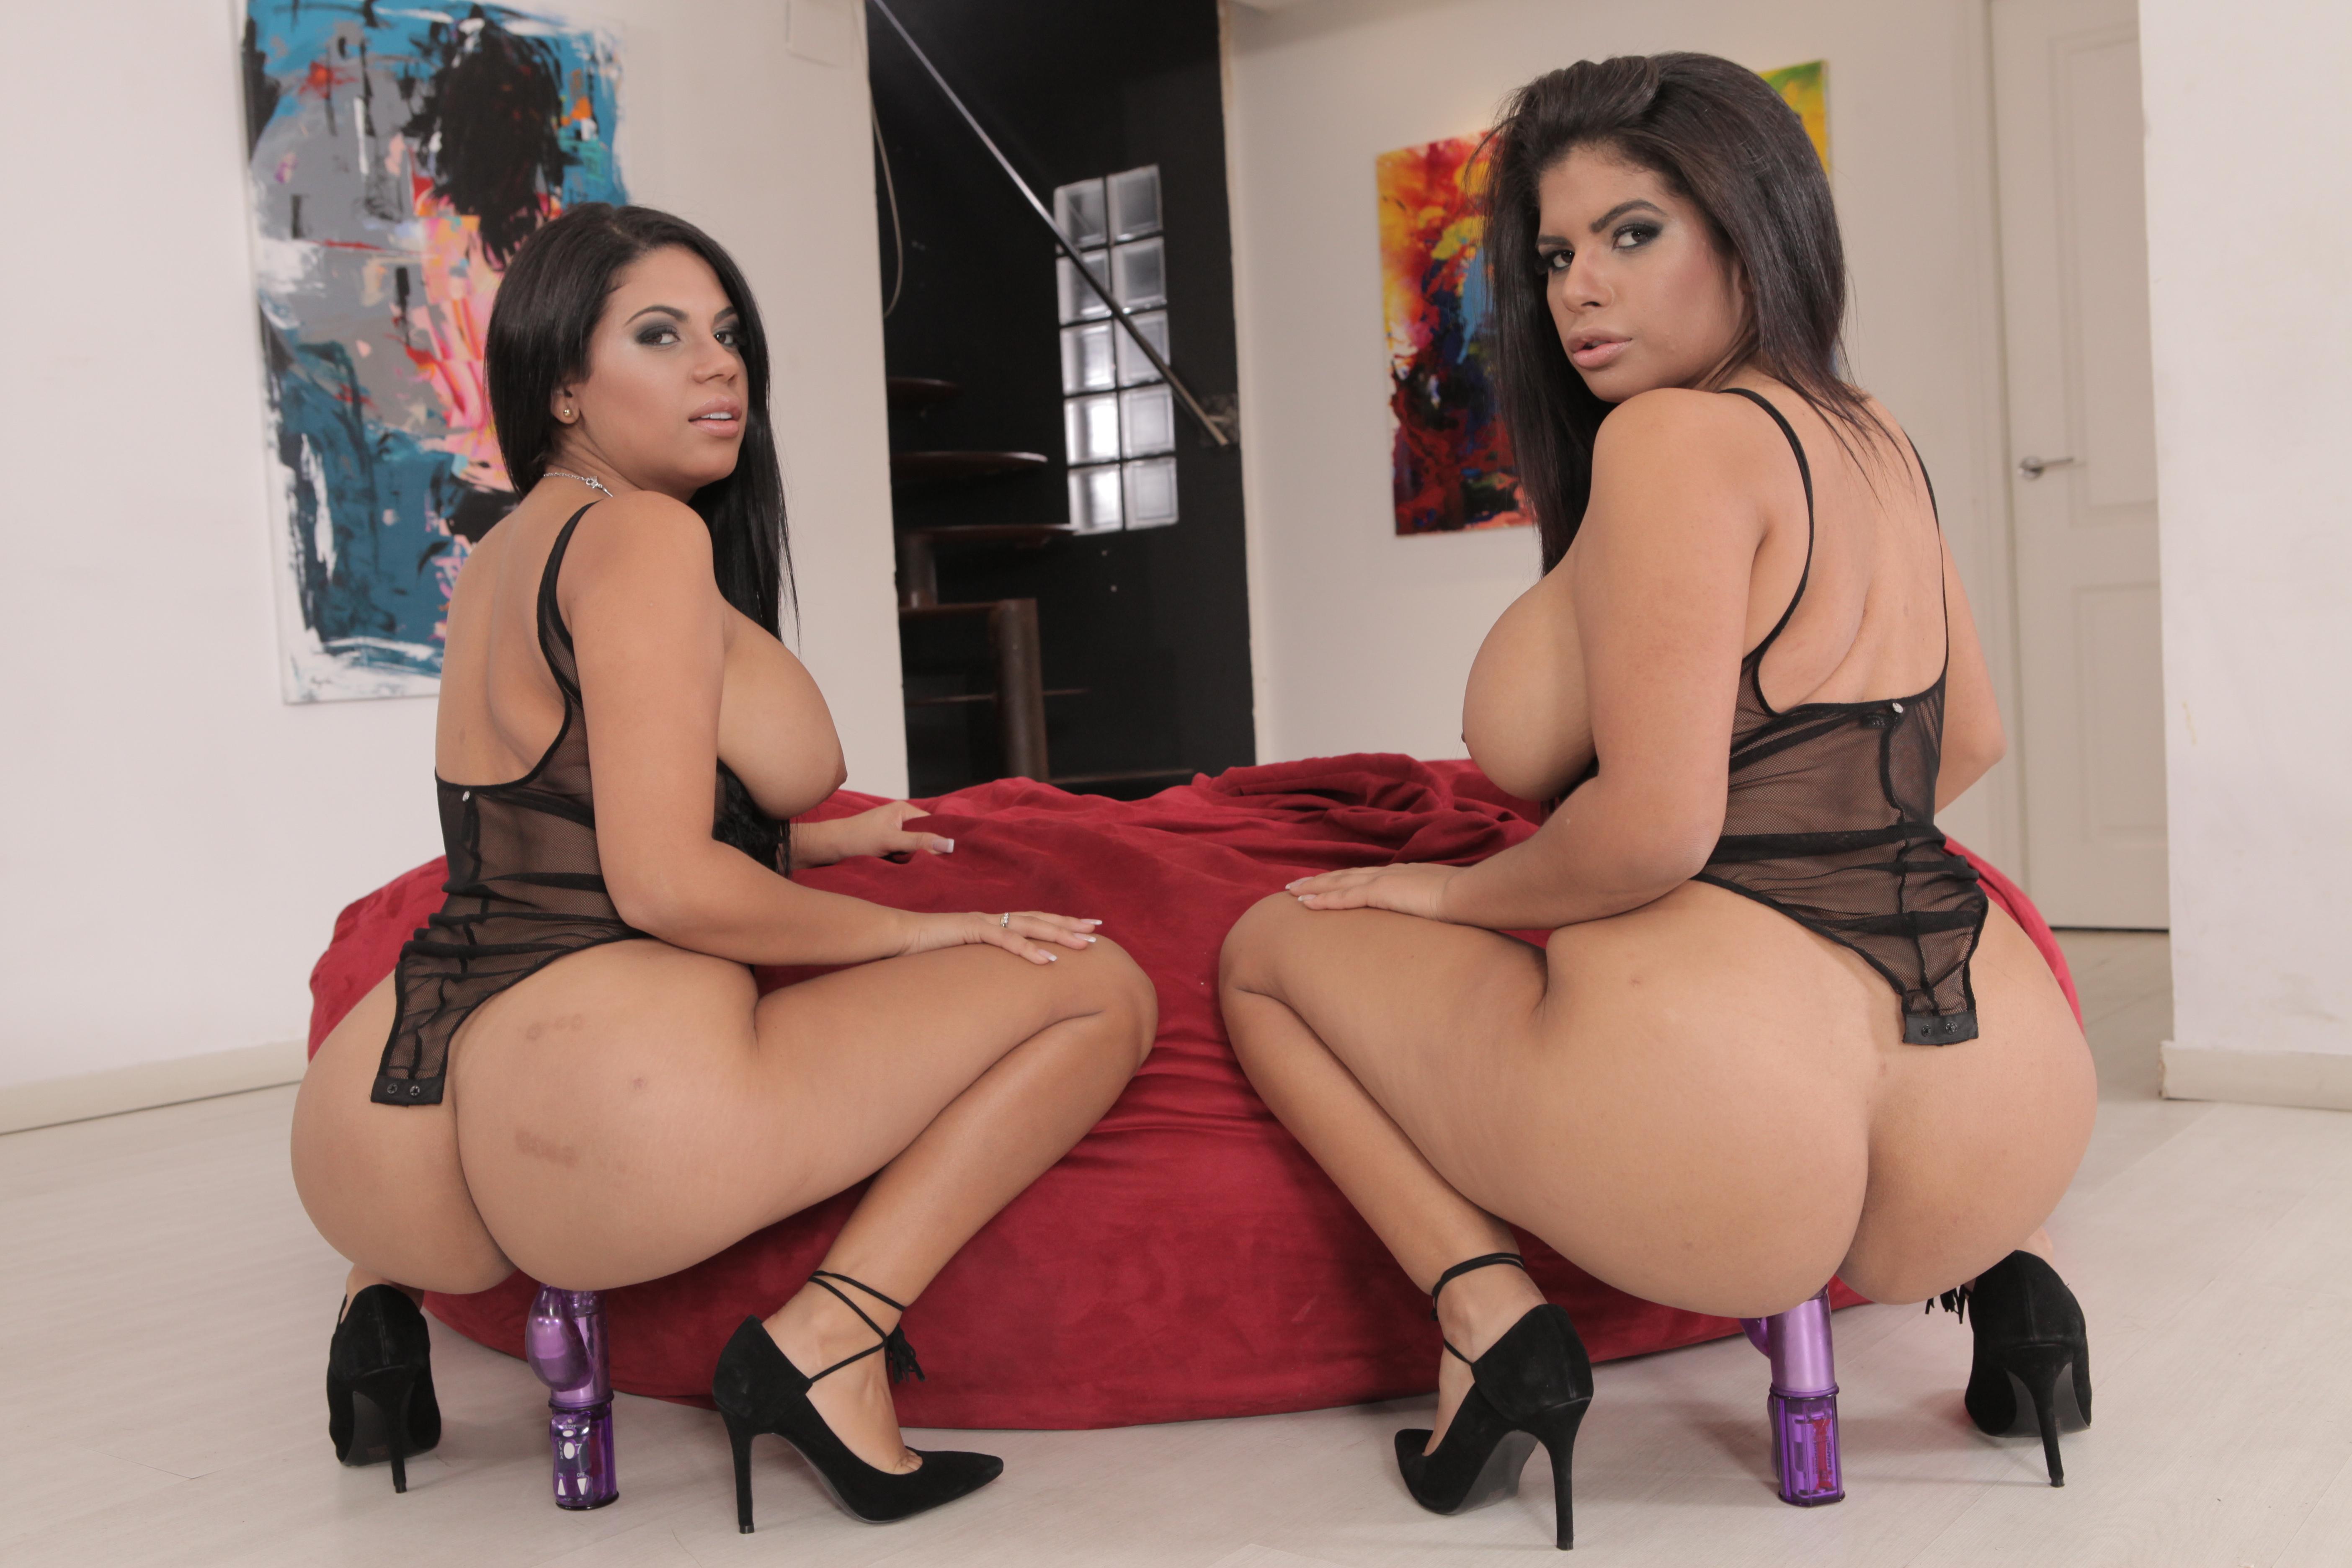 Venezuelan curvy latina kesha ortega works on a big dick 2